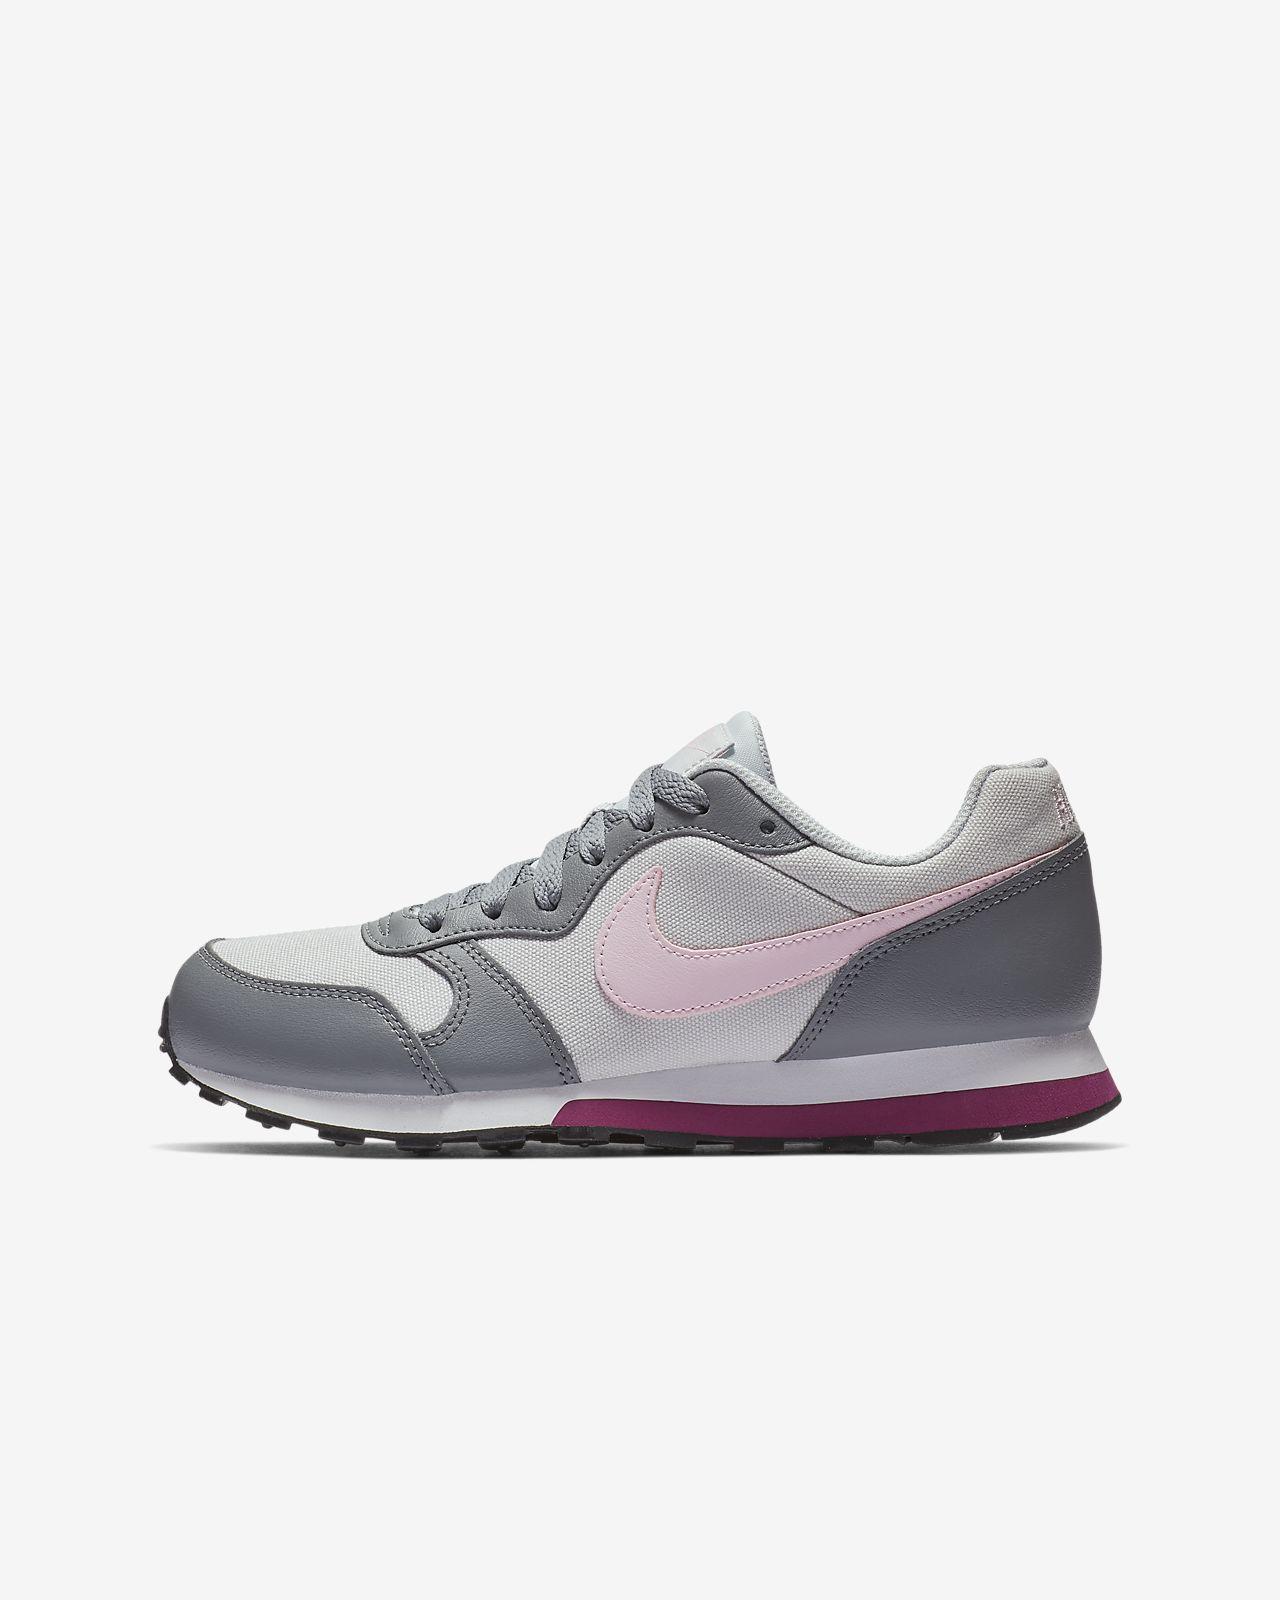 Schuh Kinder Nike 2 Für At Runner Ältere Md RYRZwqAt